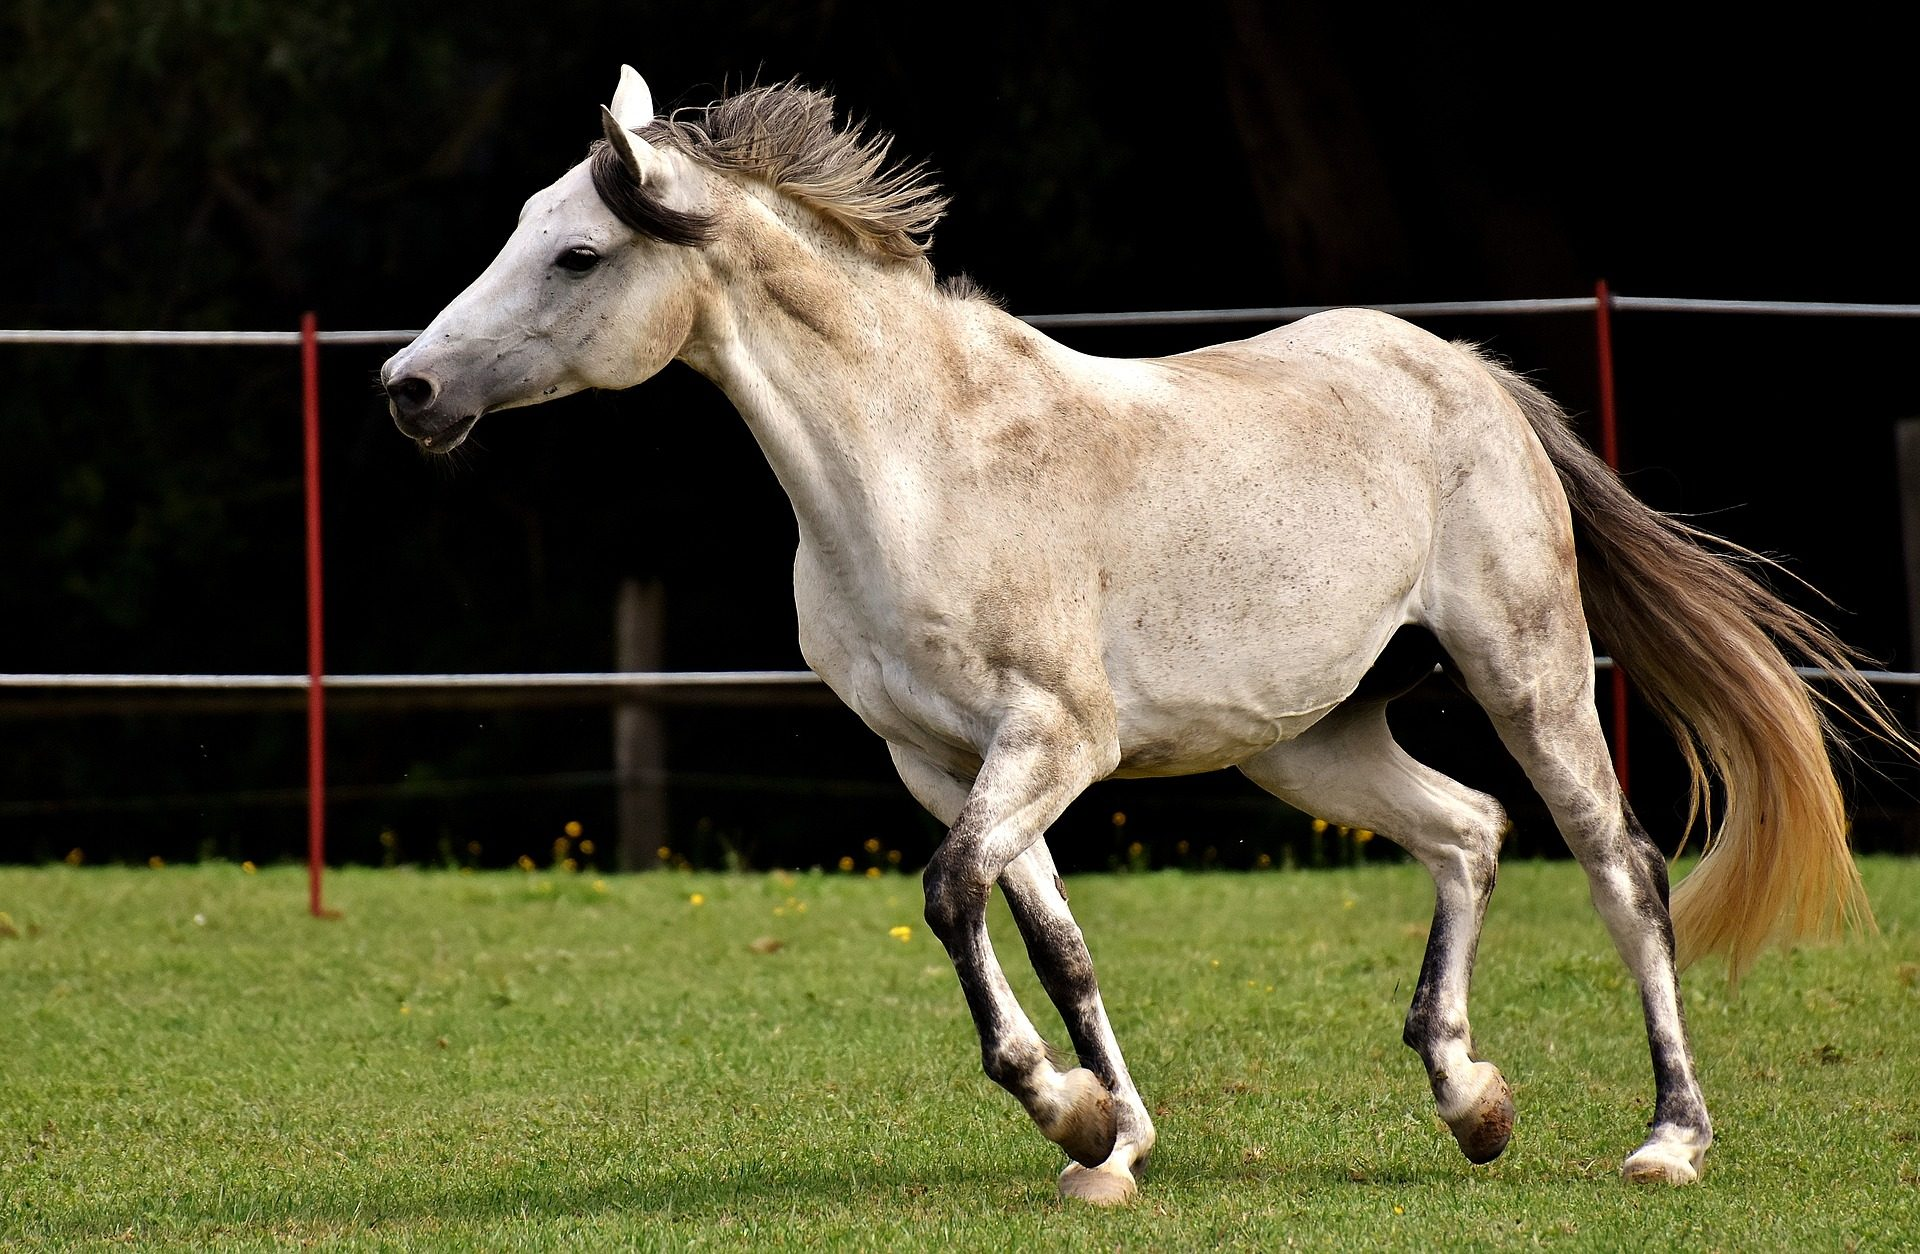 घोड़ा, सरपट, लगातार, प्रशिक्षण, लॉन, घास - HD वॉलपेपर - प्रोफेसर-falken.com